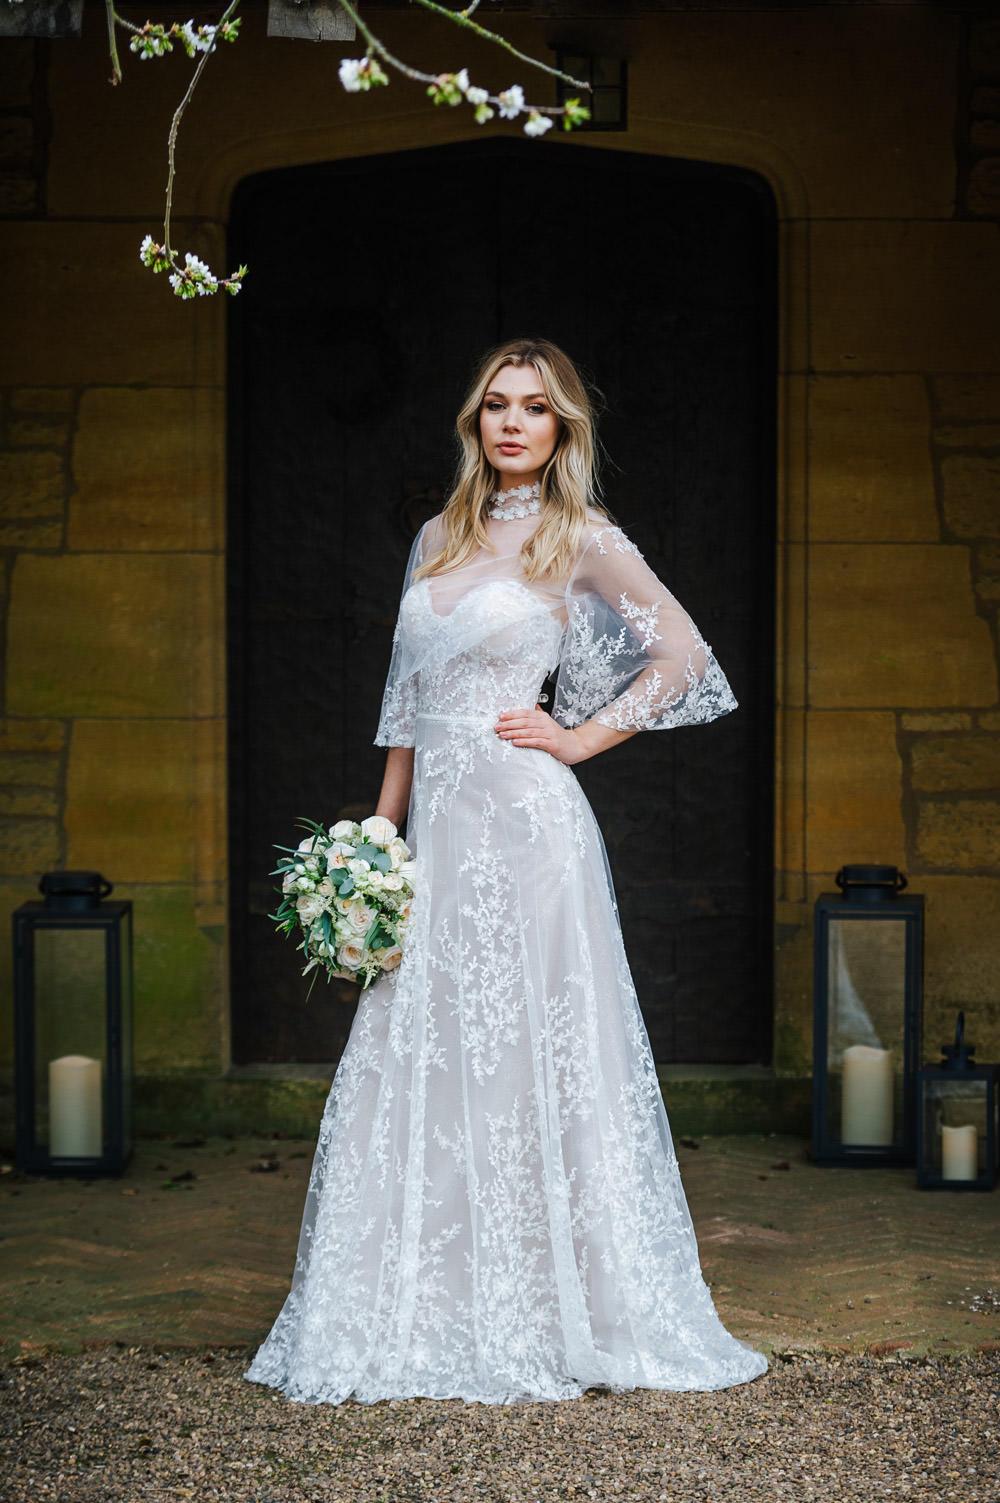 Dress Gown Bride Bridal Straps Train Lace Cape Cherry Blossom Wedding Ideas Sugarbird Photography